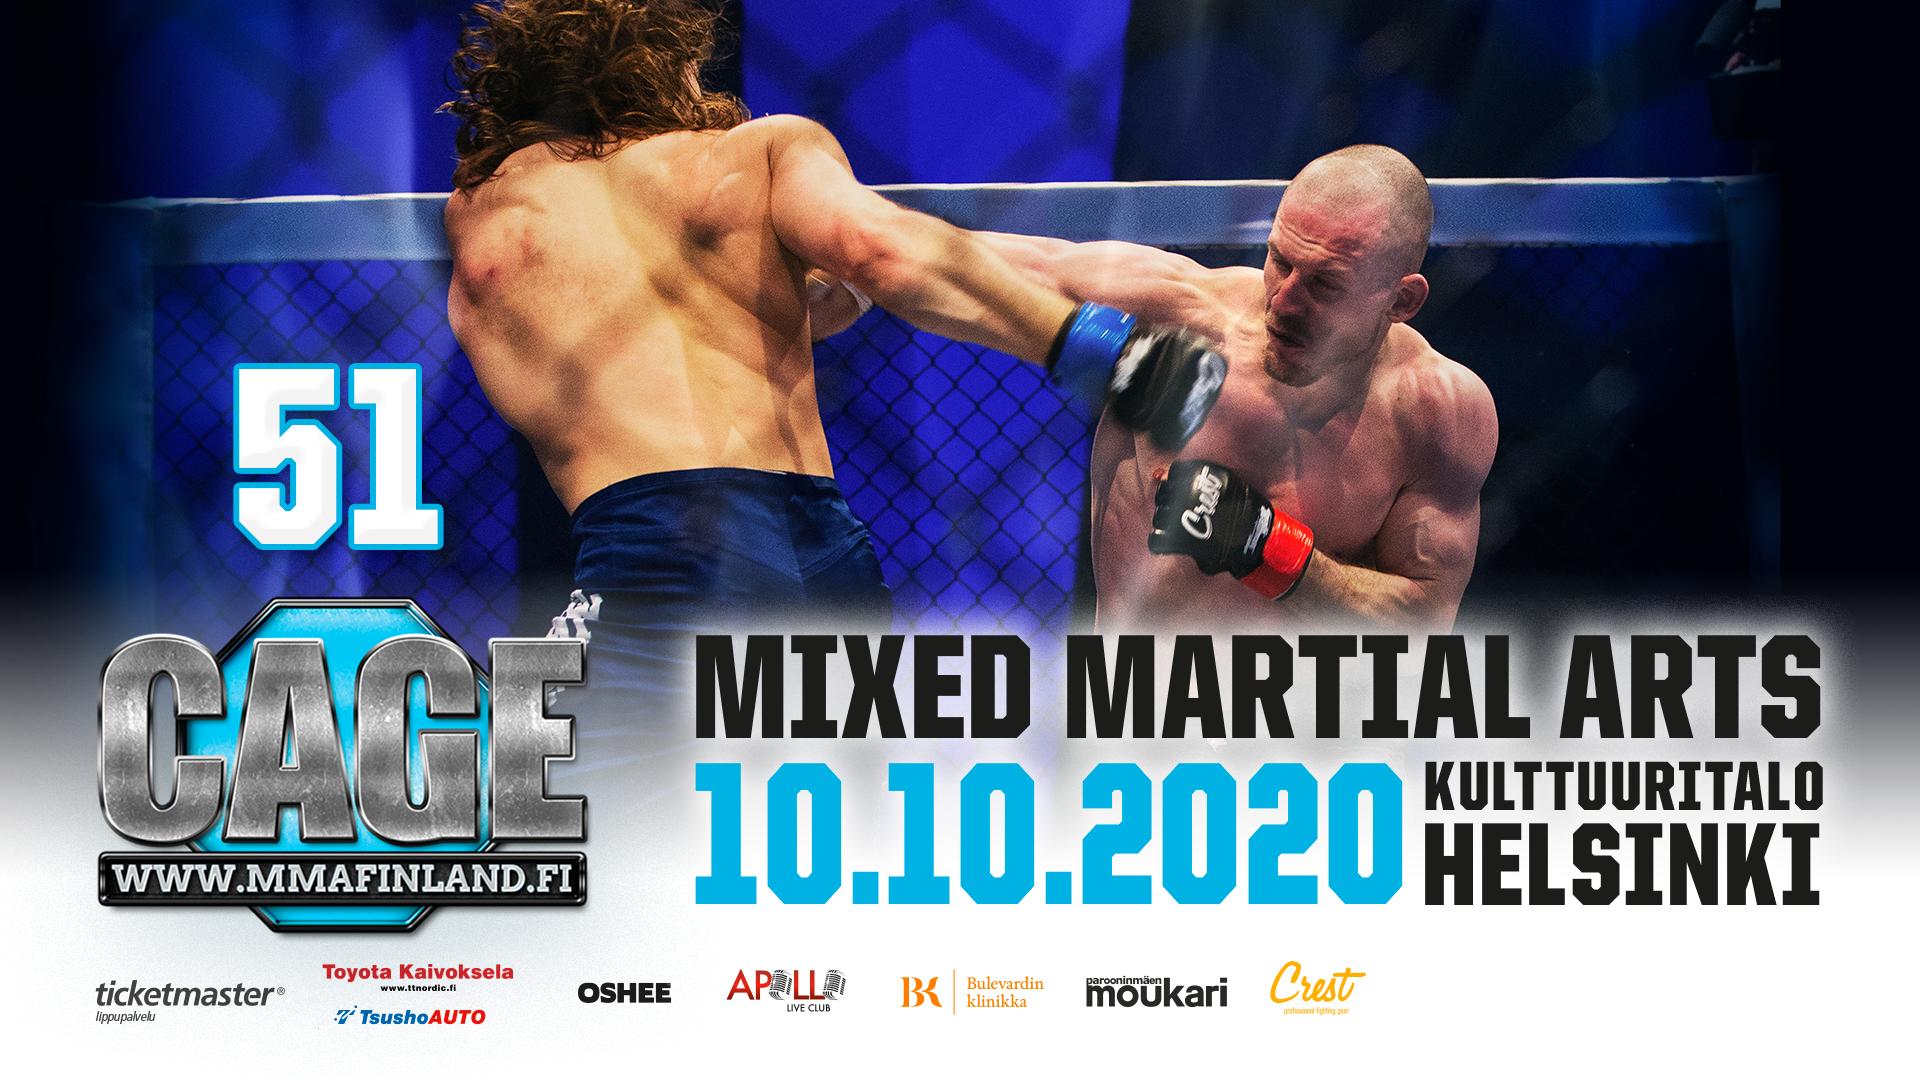 CAGE 51 MMA Kulttuuritalo 10.10.2020   MMA Finland Oy